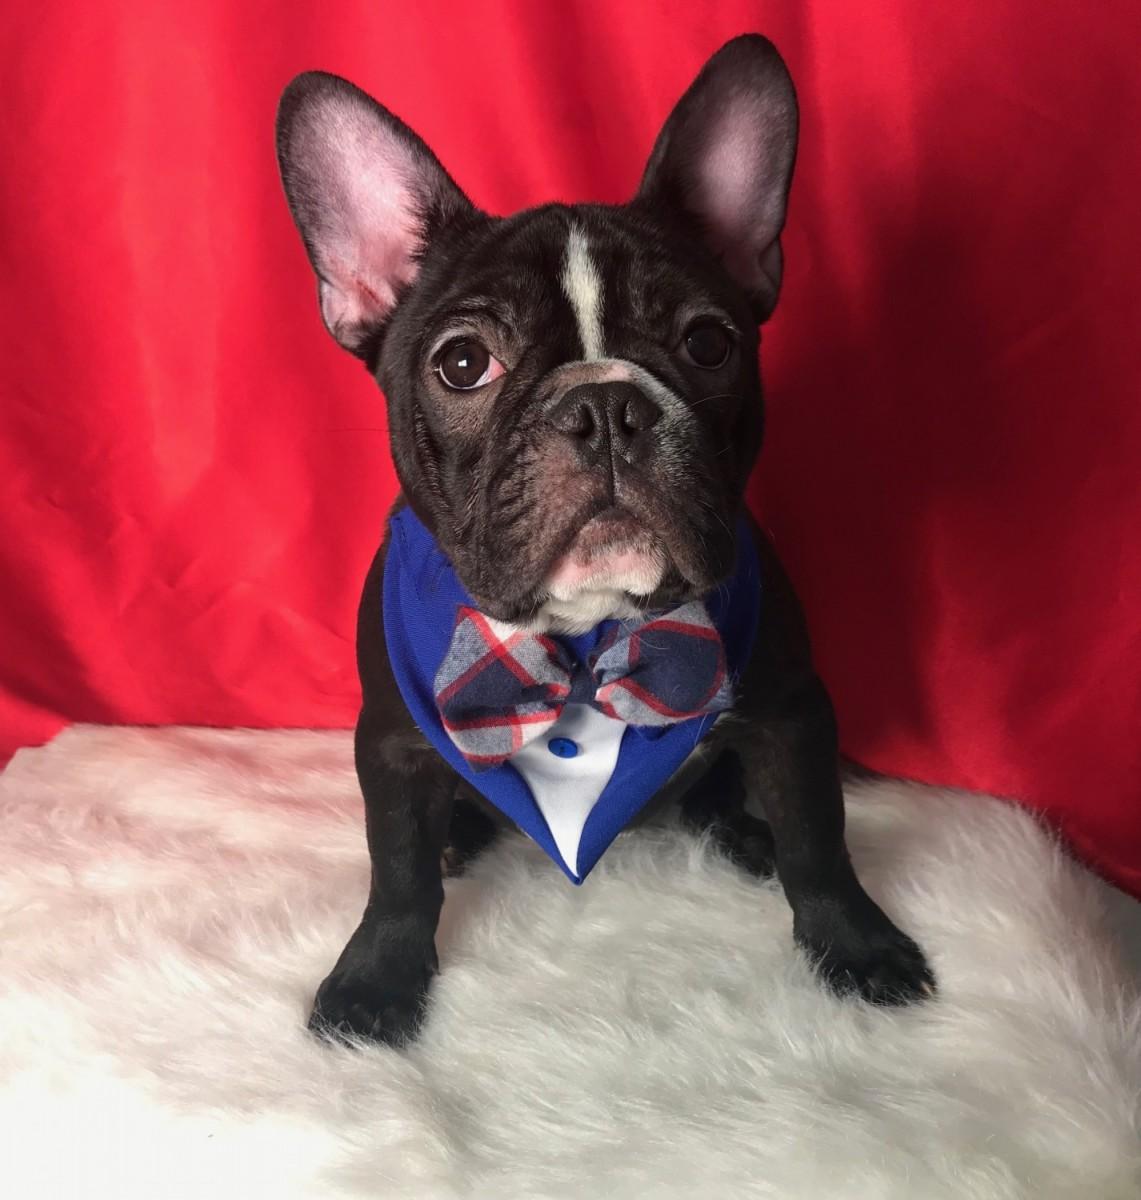 French Bulldog For Sale in Rhode Island (17)   Petzlover